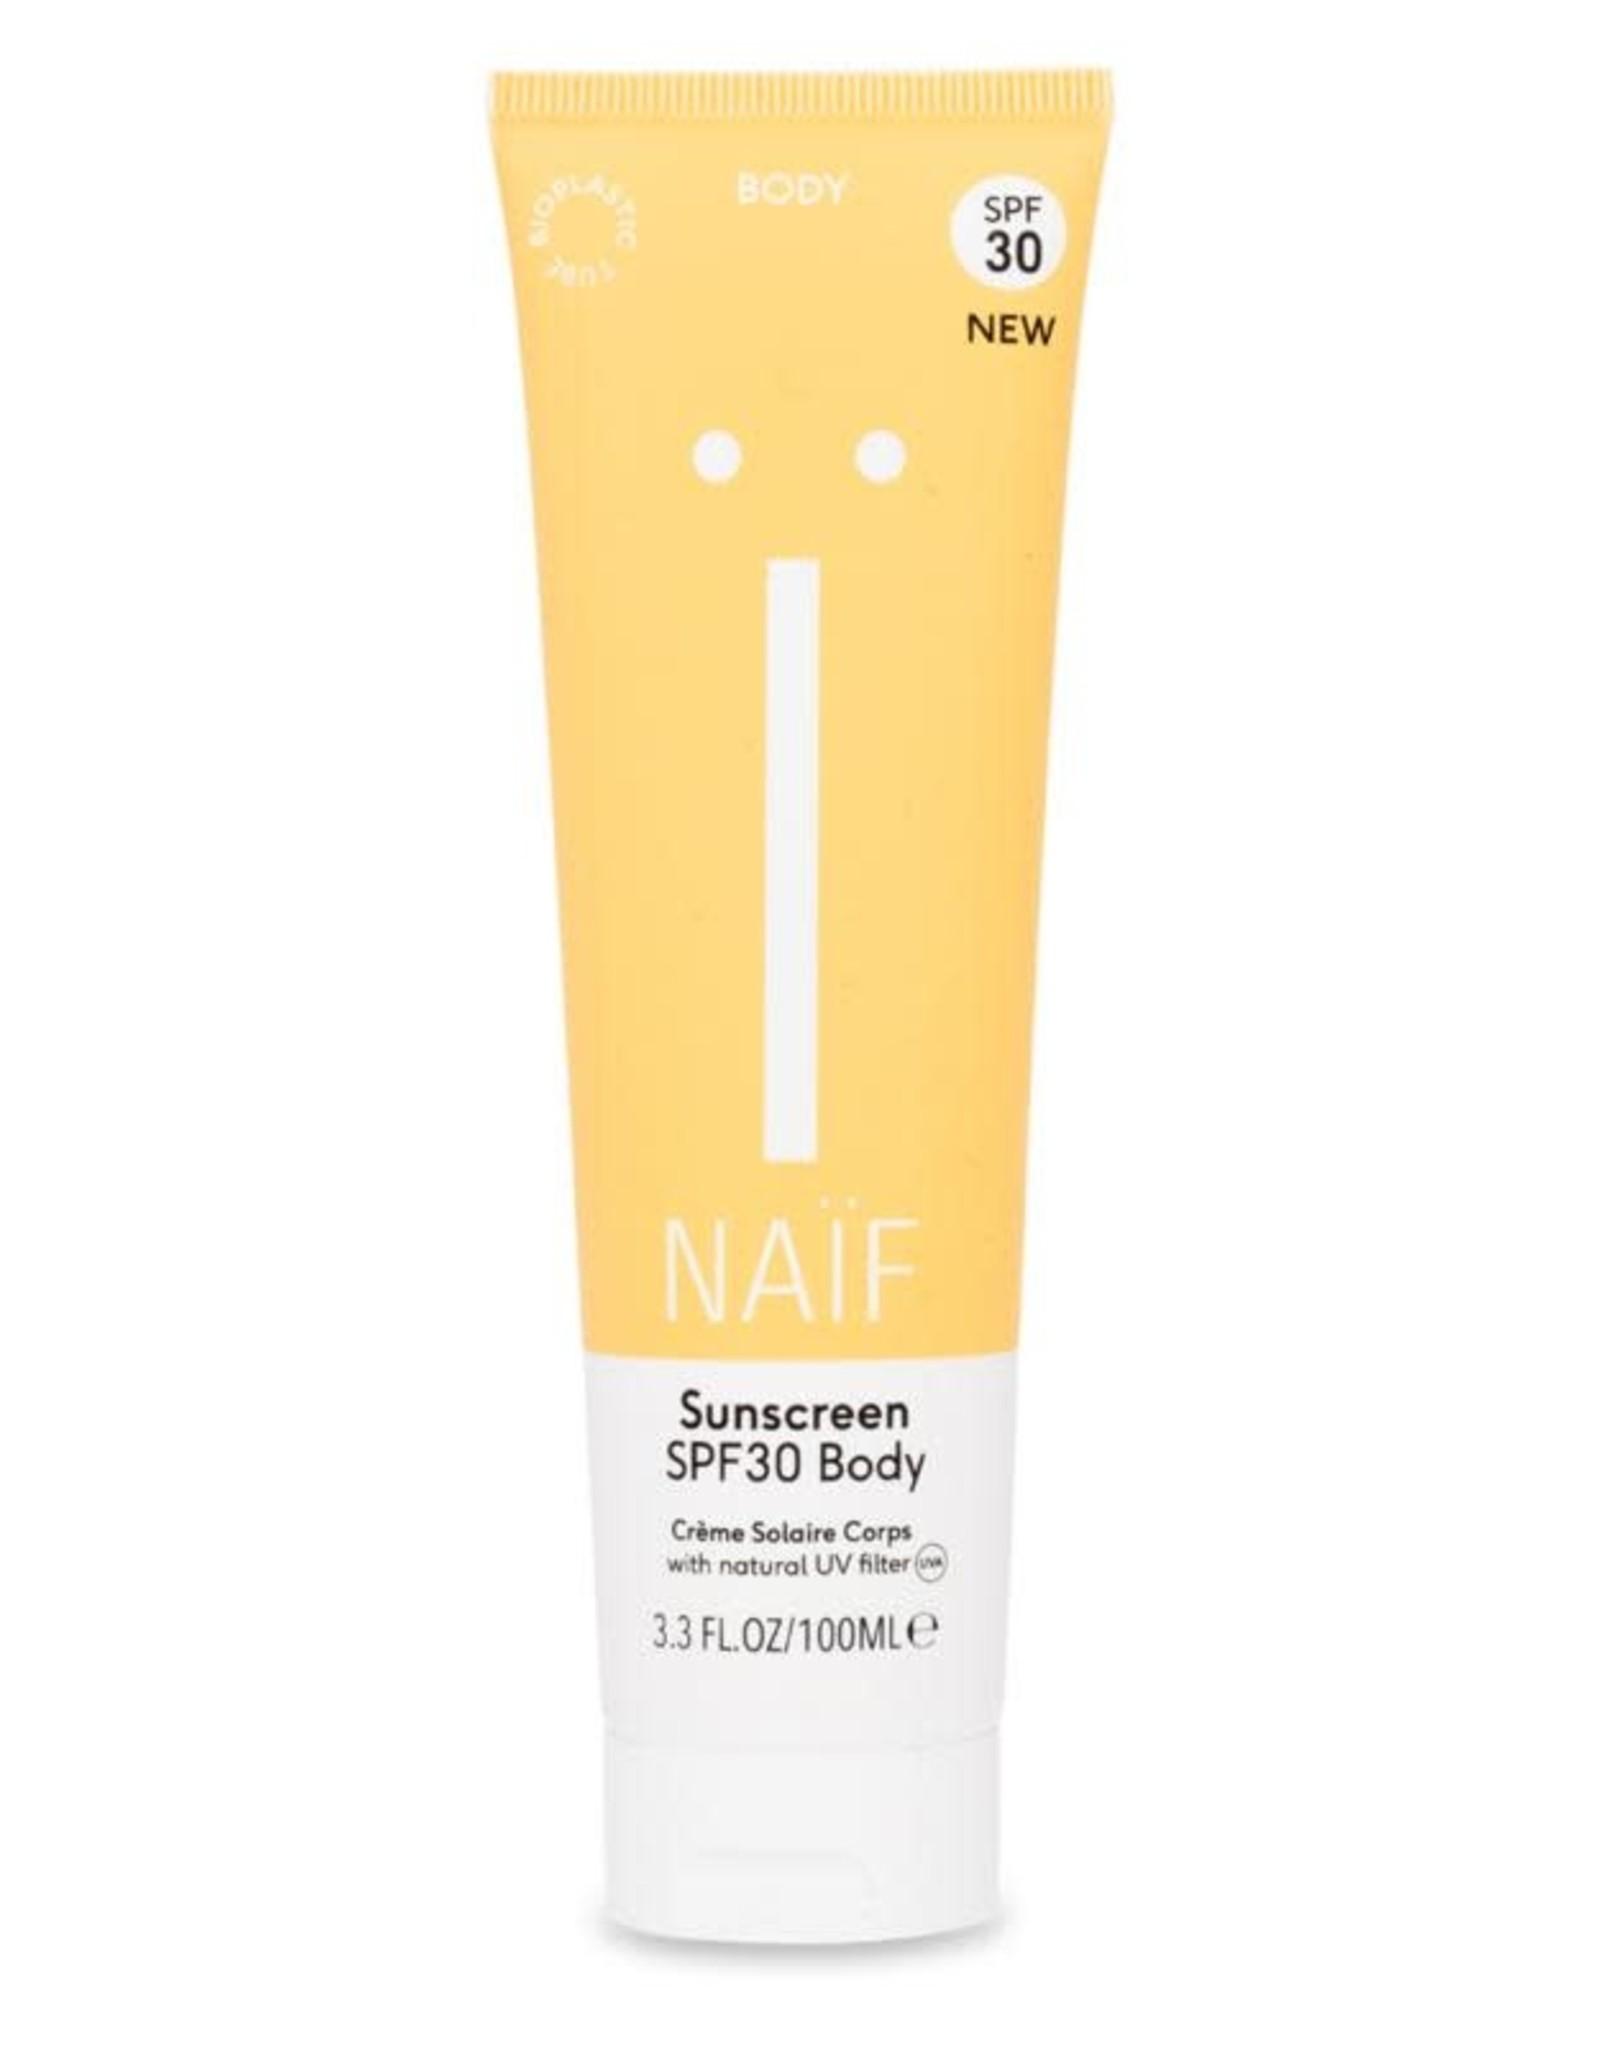 Naïf Sunscreen body SPF30 100ml